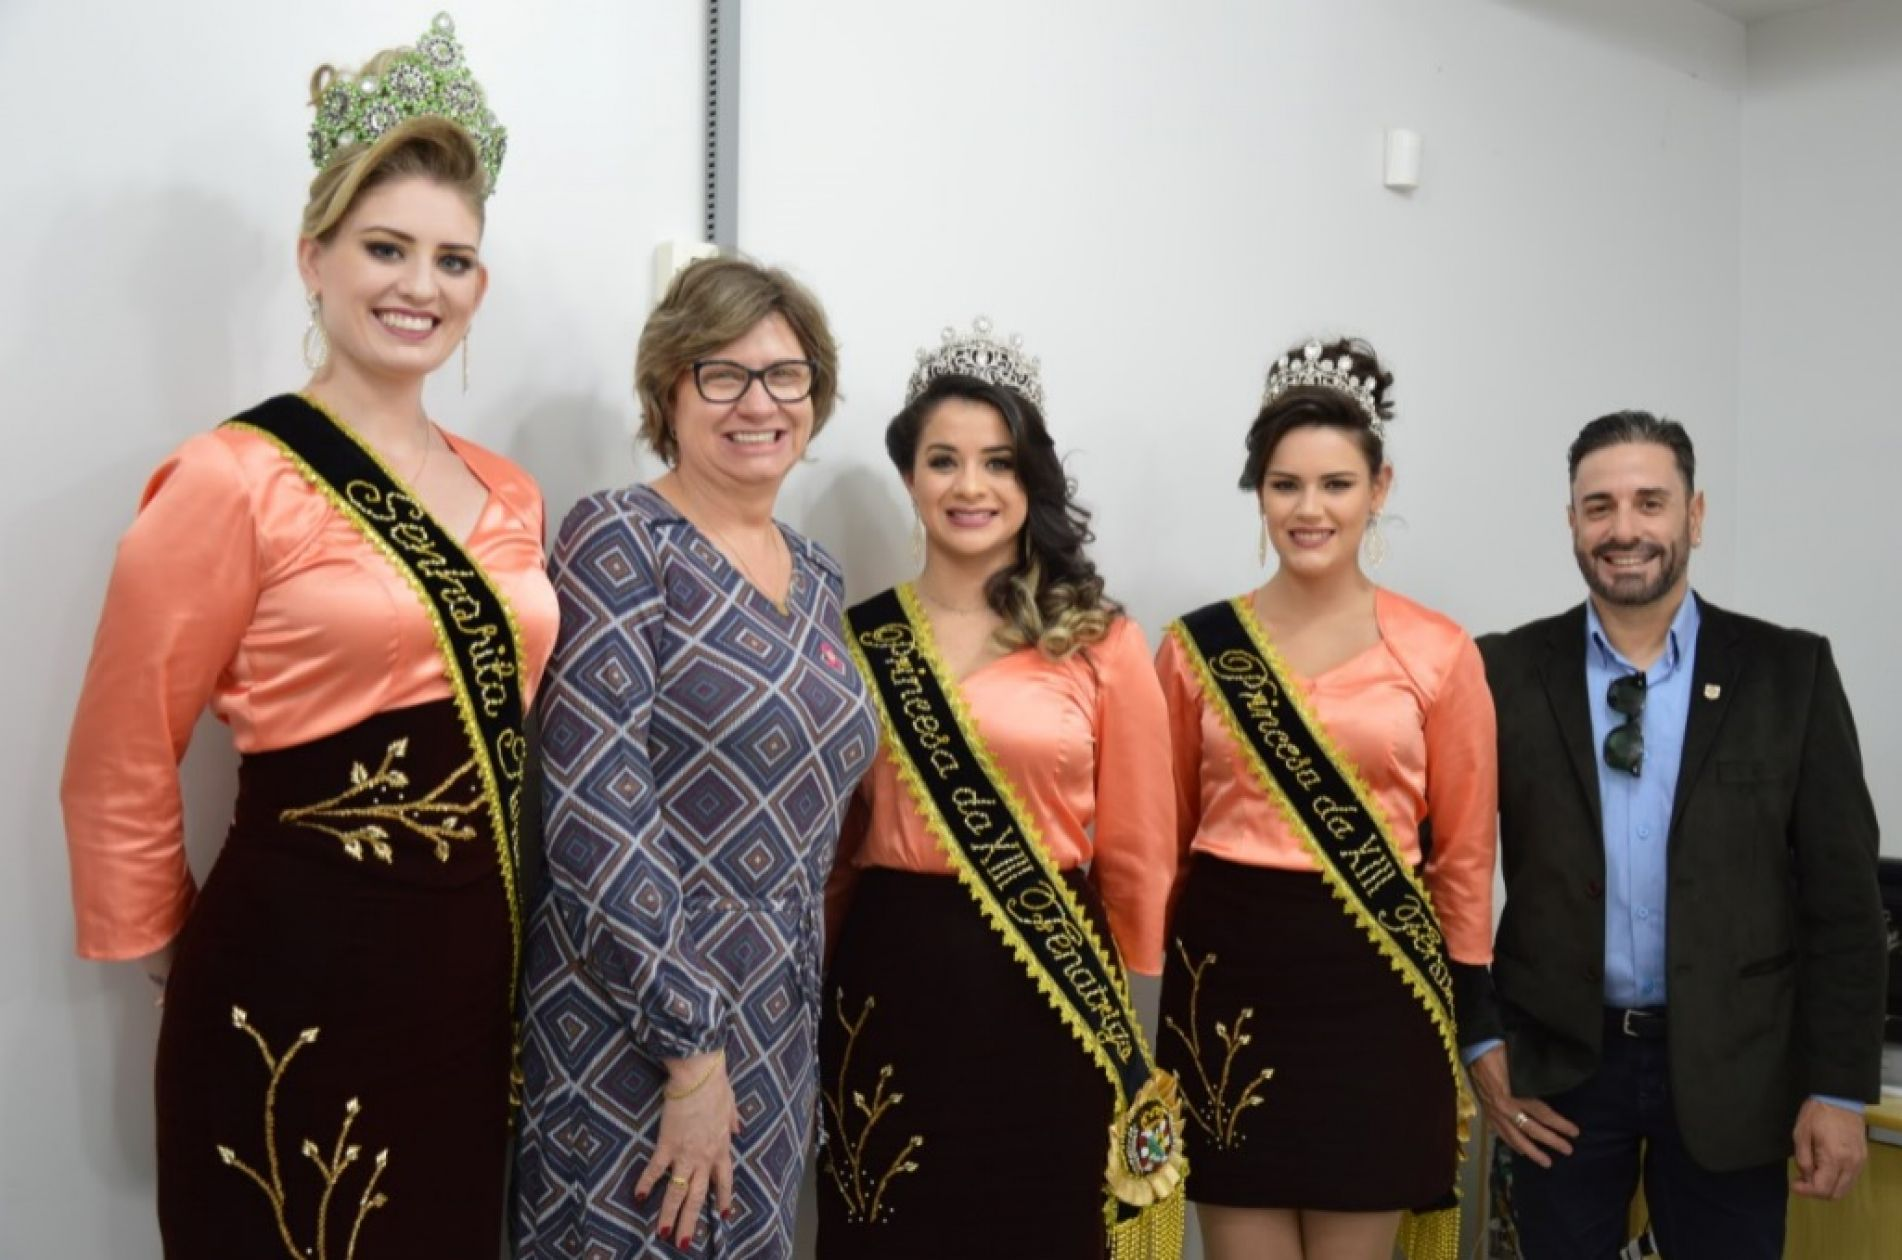 XIII Fenatrigo: Comissão Social realiza entrega de convites